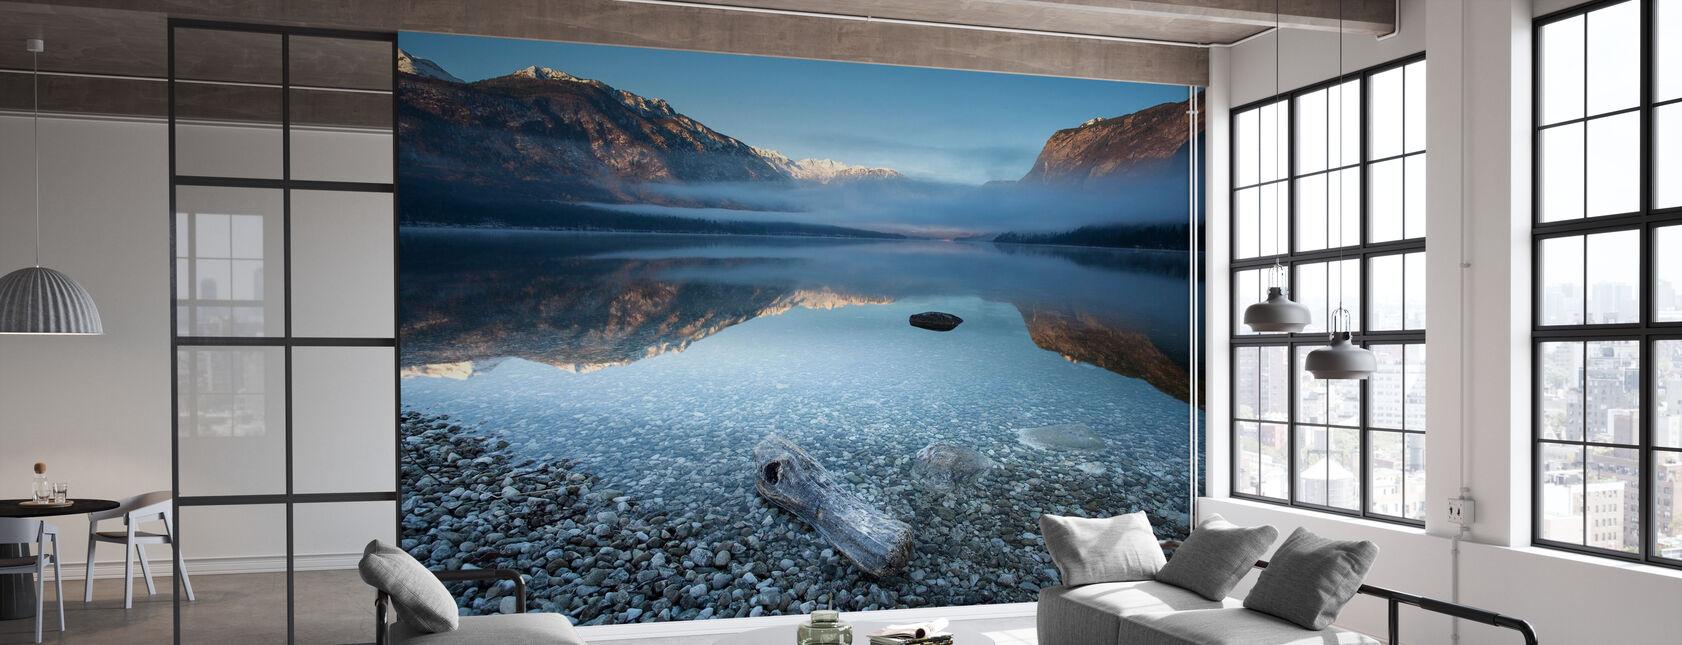 Bohinj's Tranquility - Wallpaper - Office